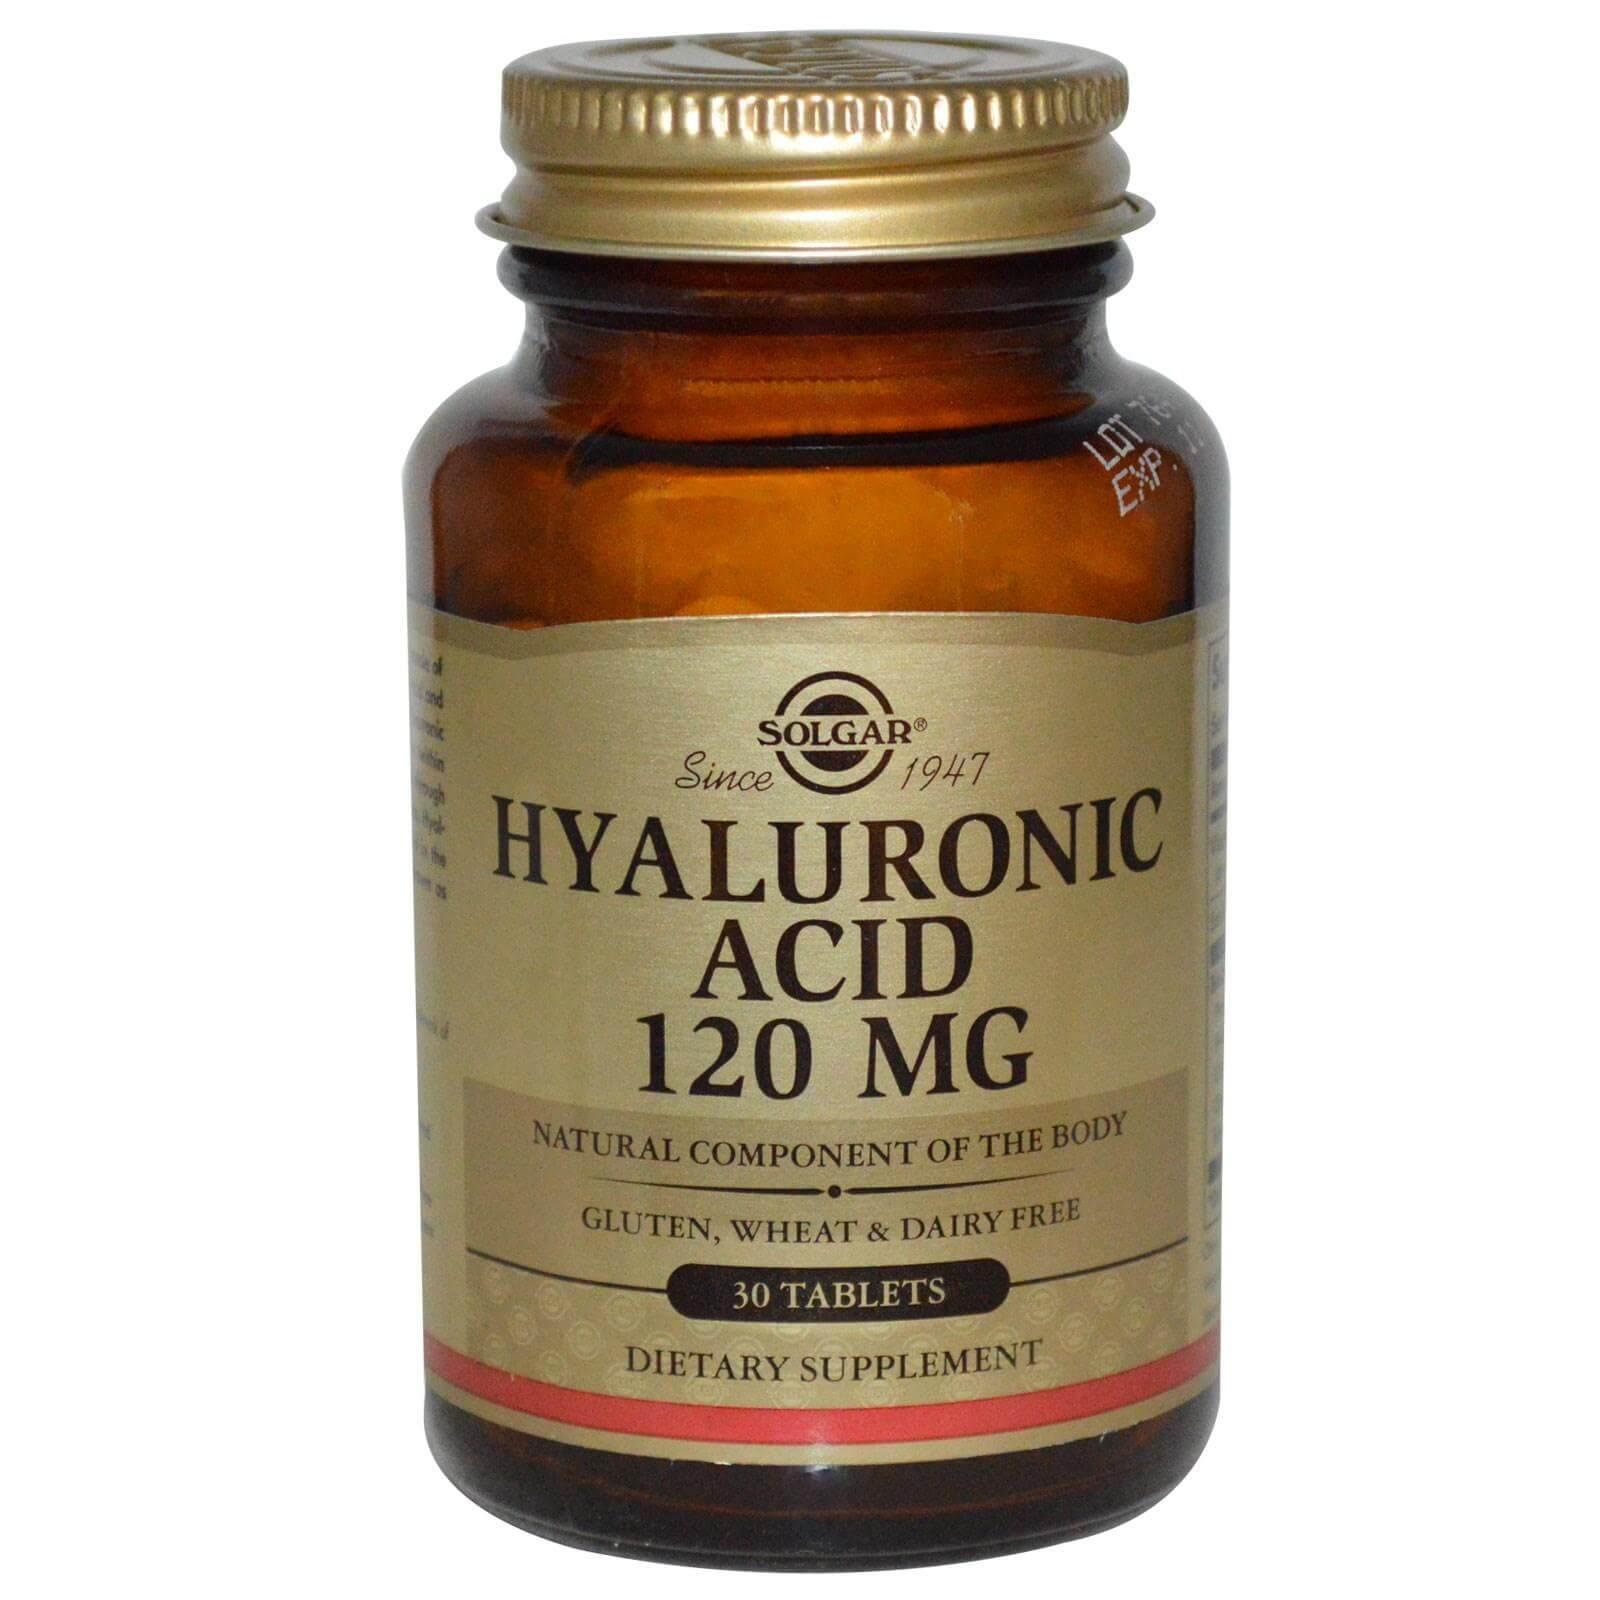 Solgar Hyaluronic Acid Complex 120mg Συμπλήρωμα Διατροφής Υαλουρονικού Οξέως για την Ανάπλαση & Ελαστικότητα της Επιδερμίδας 30s